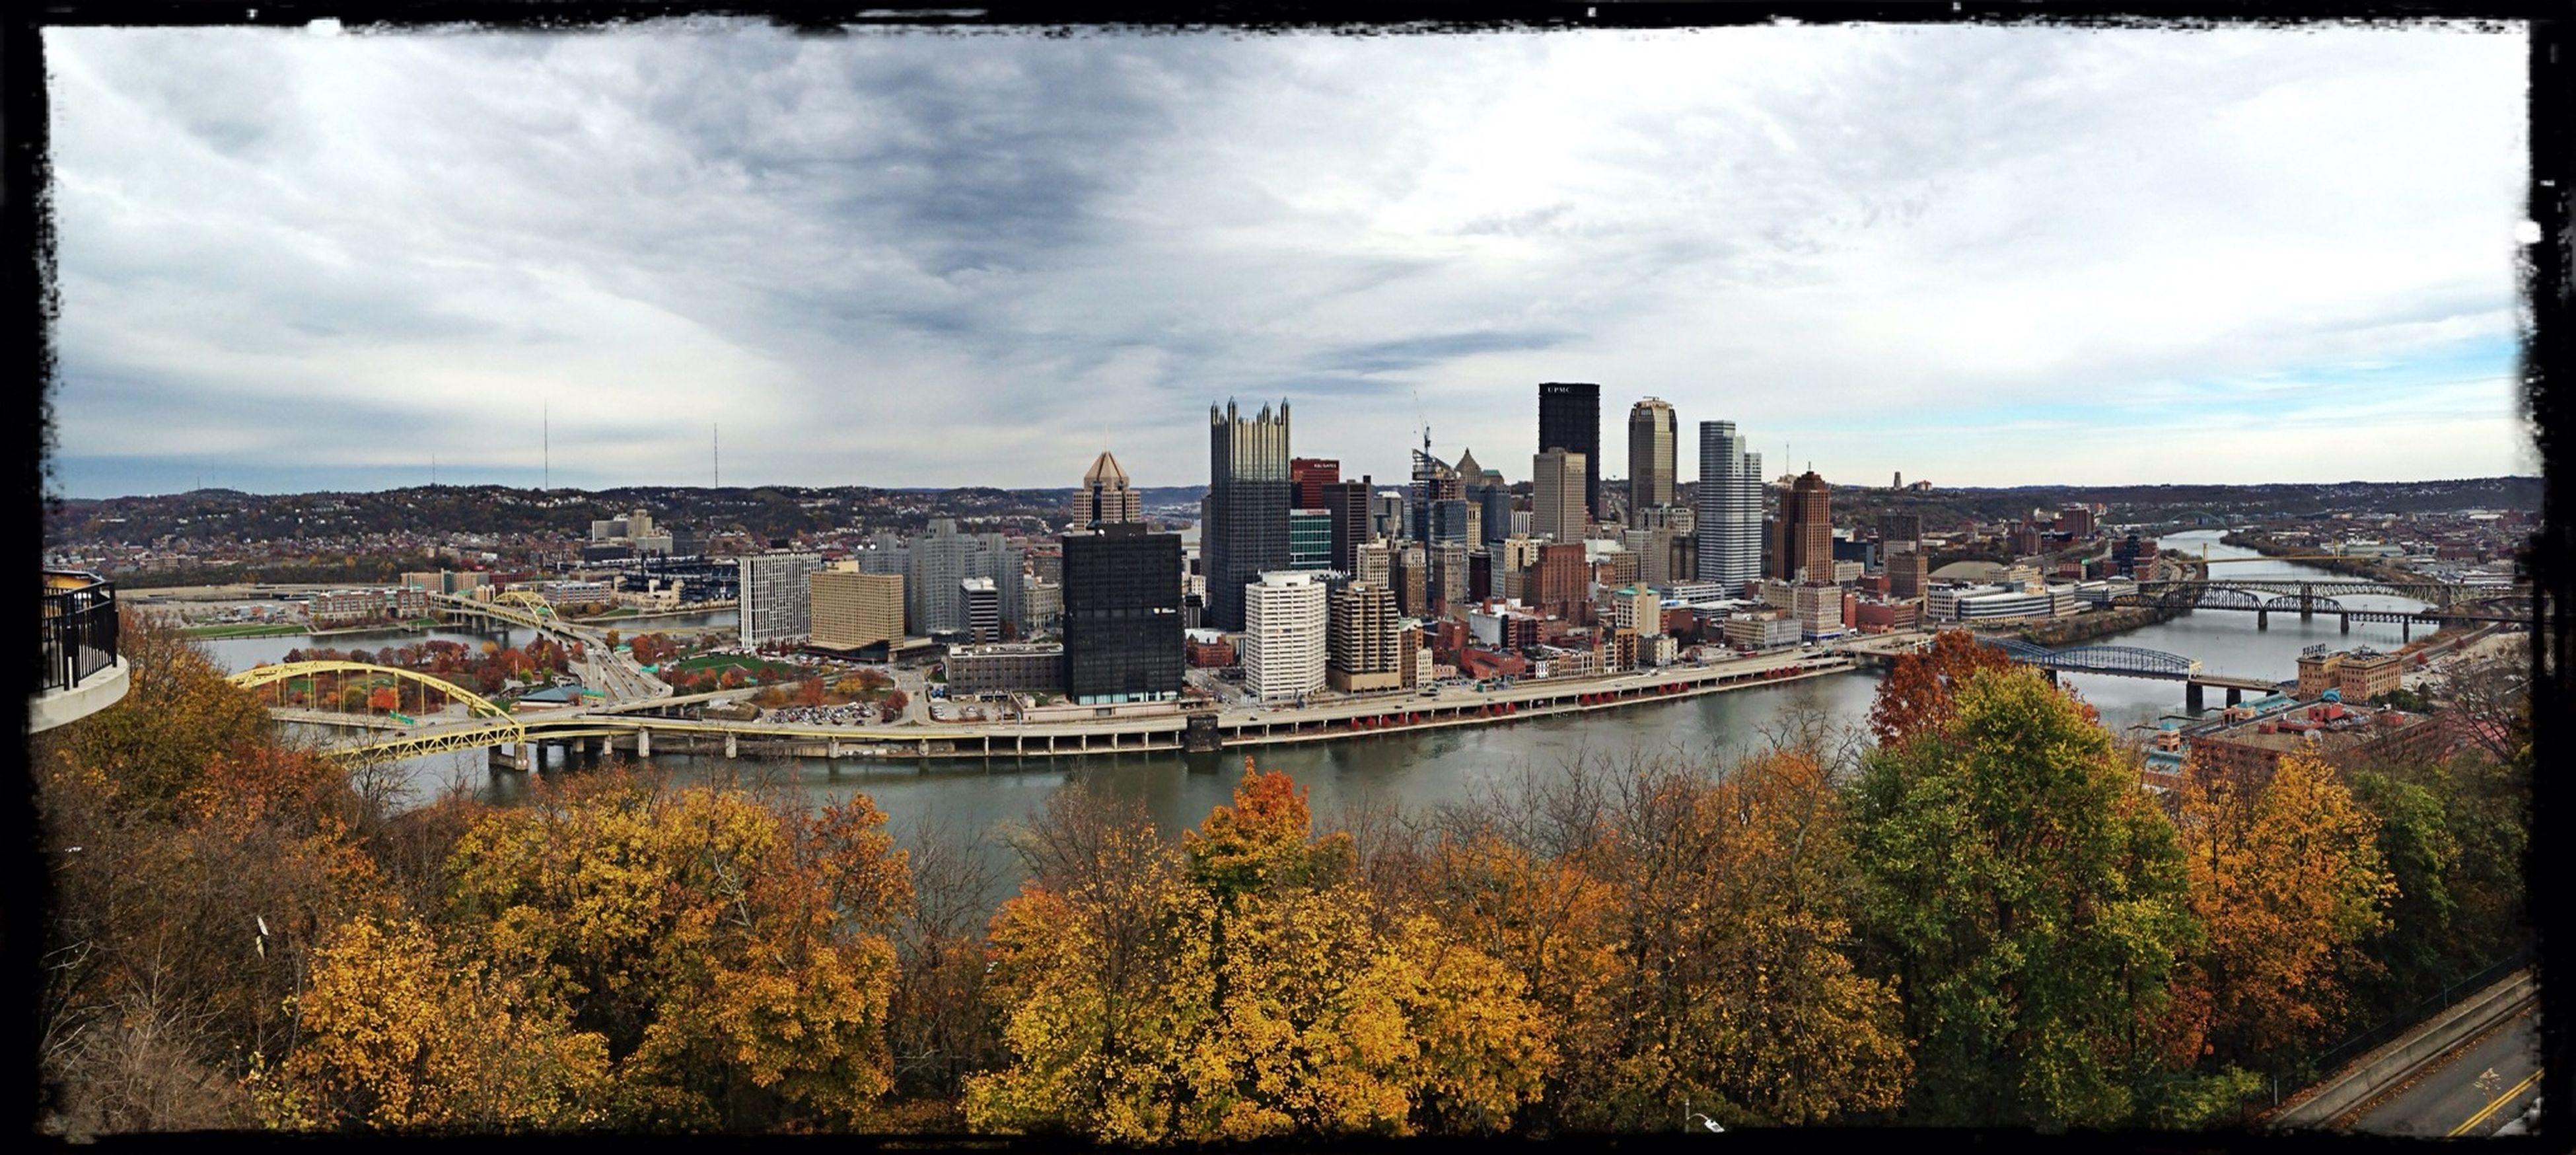 Autumn Colorss EyeEm Best Shots IPhoneography Cityscapes